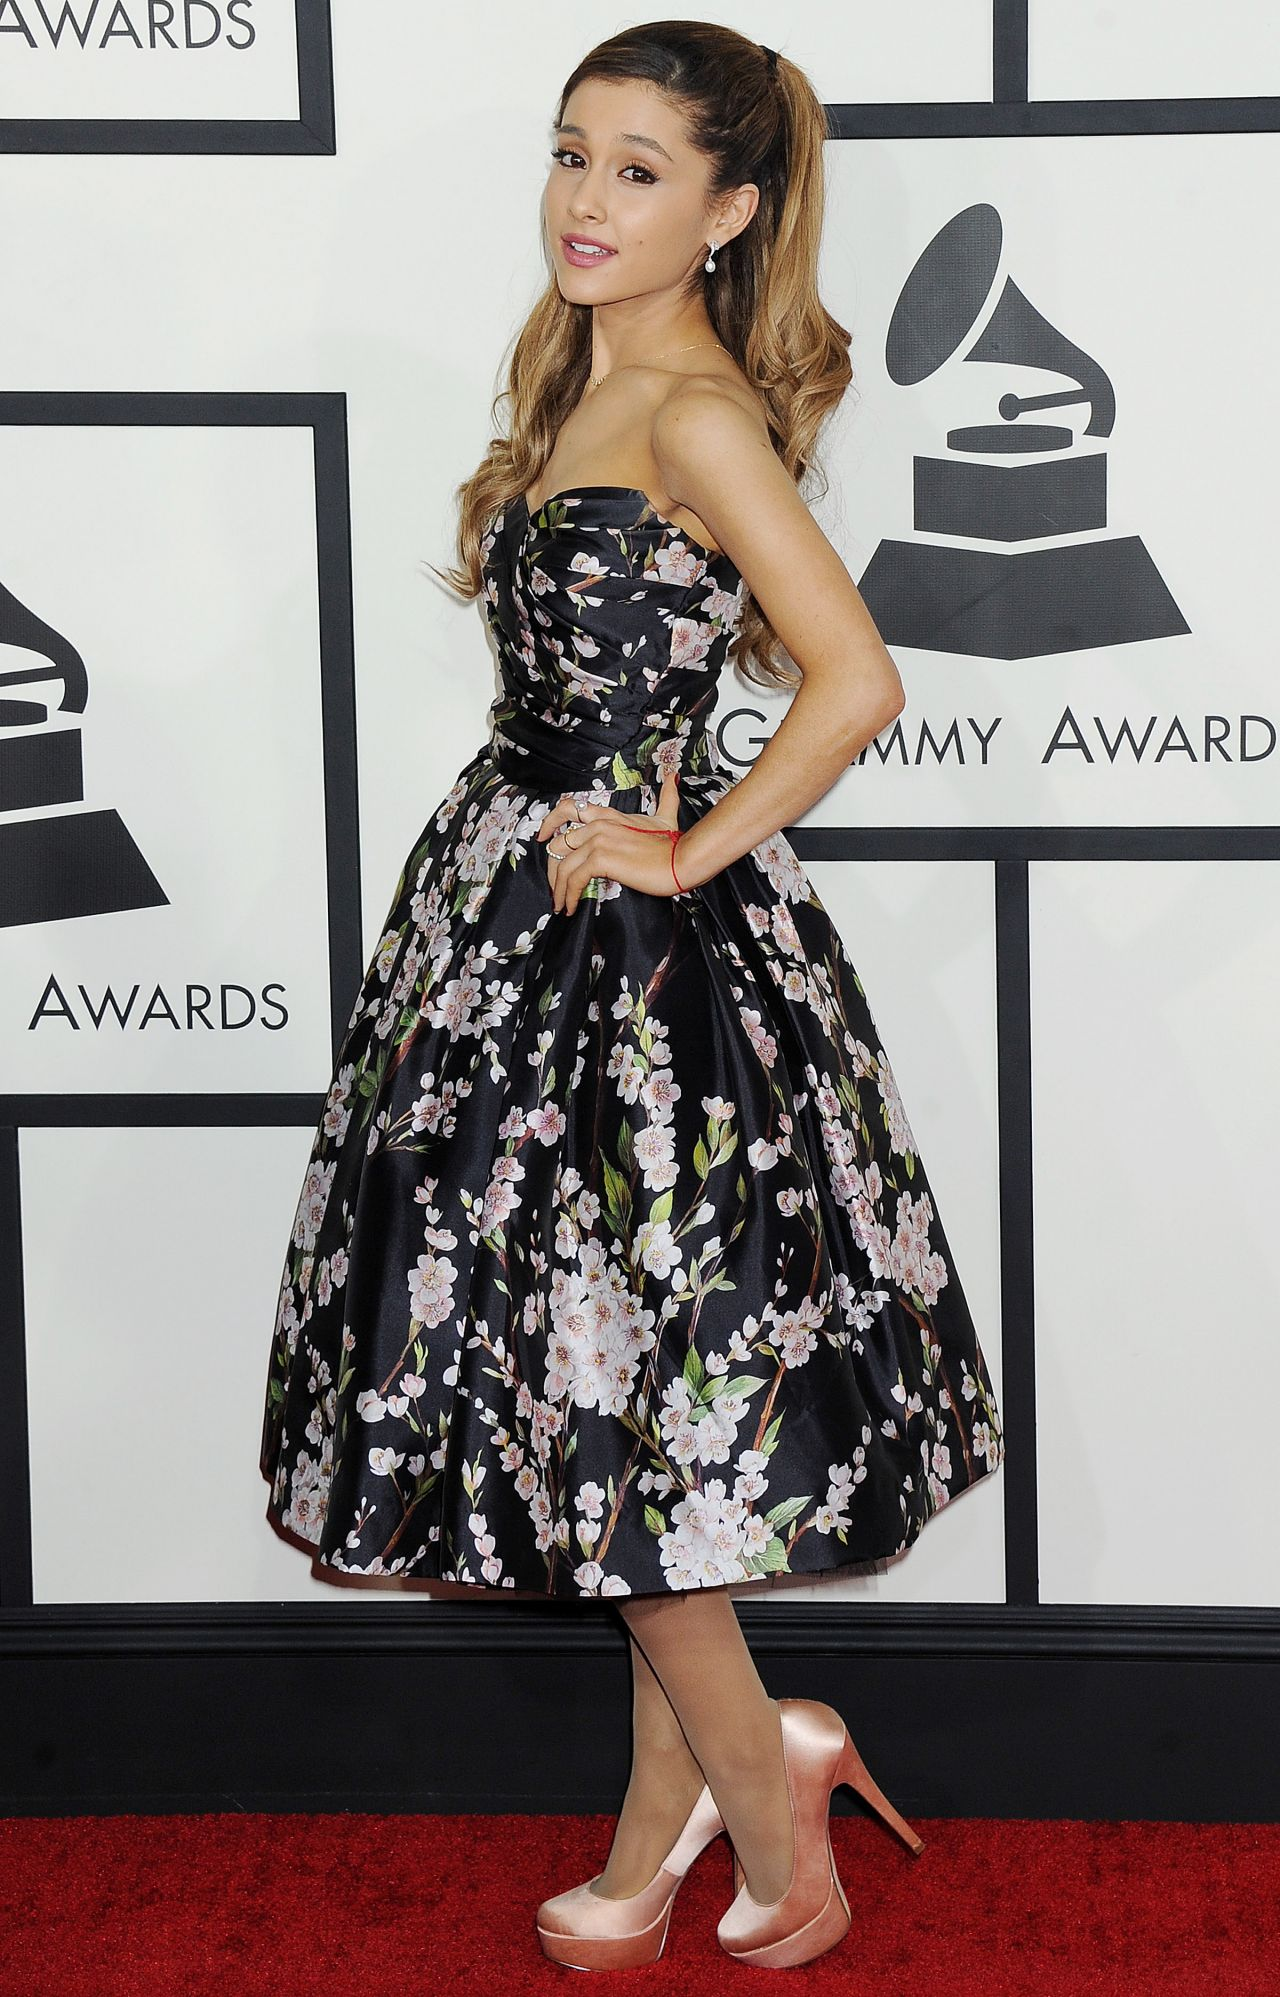 Ariana Grande - 2014 Grammy Awards